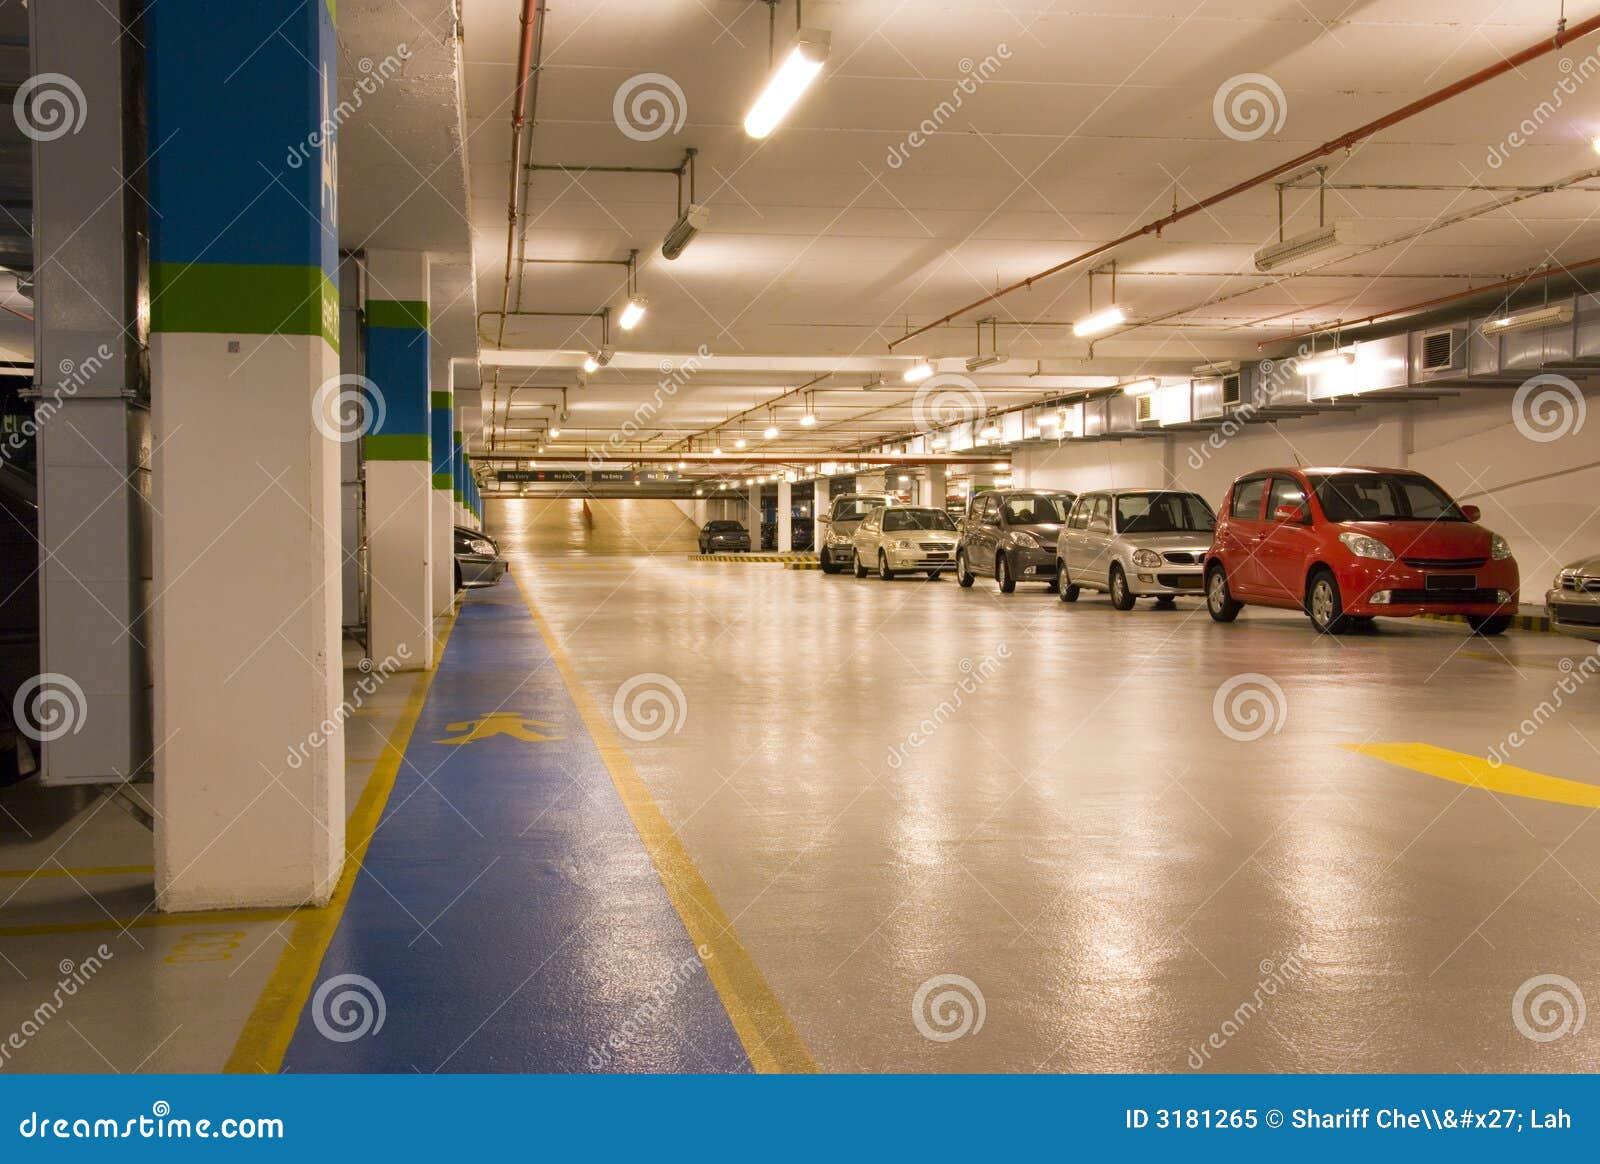 Basement Car Park Royalty Free Stock Photo Image 3181265